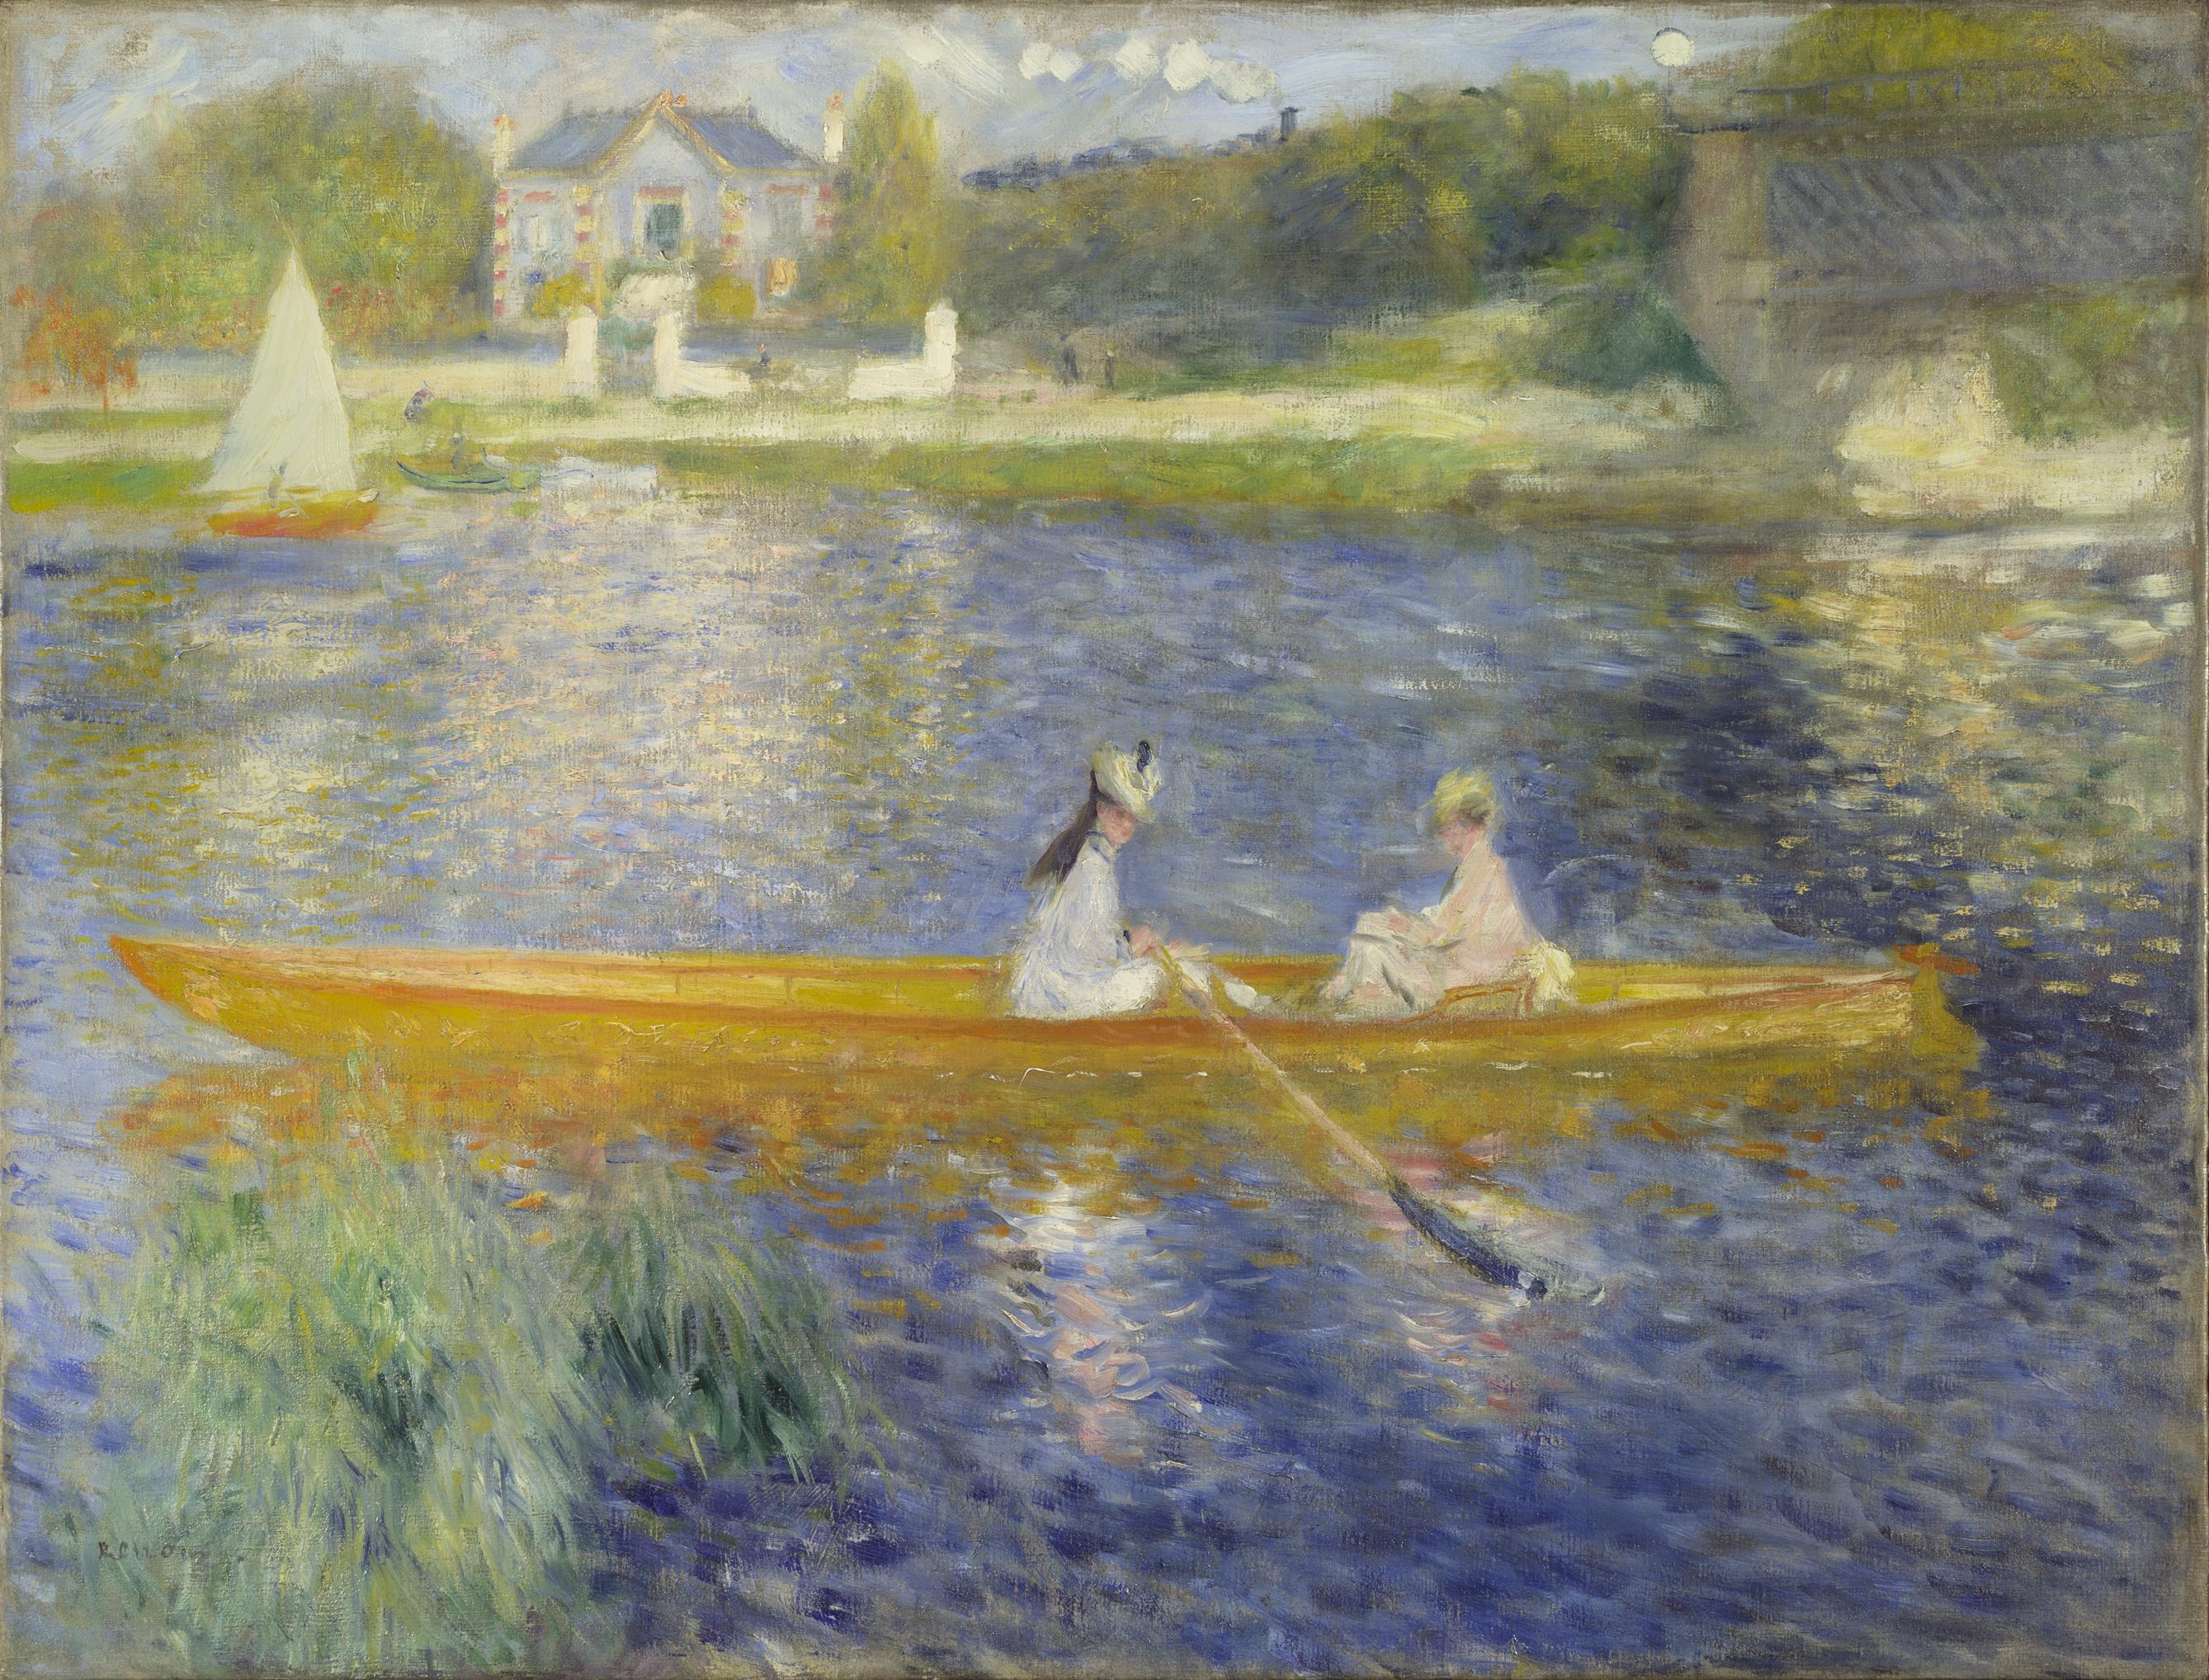 The Skiff (La Yole) - Pierre-Auguste Renoir, 1875